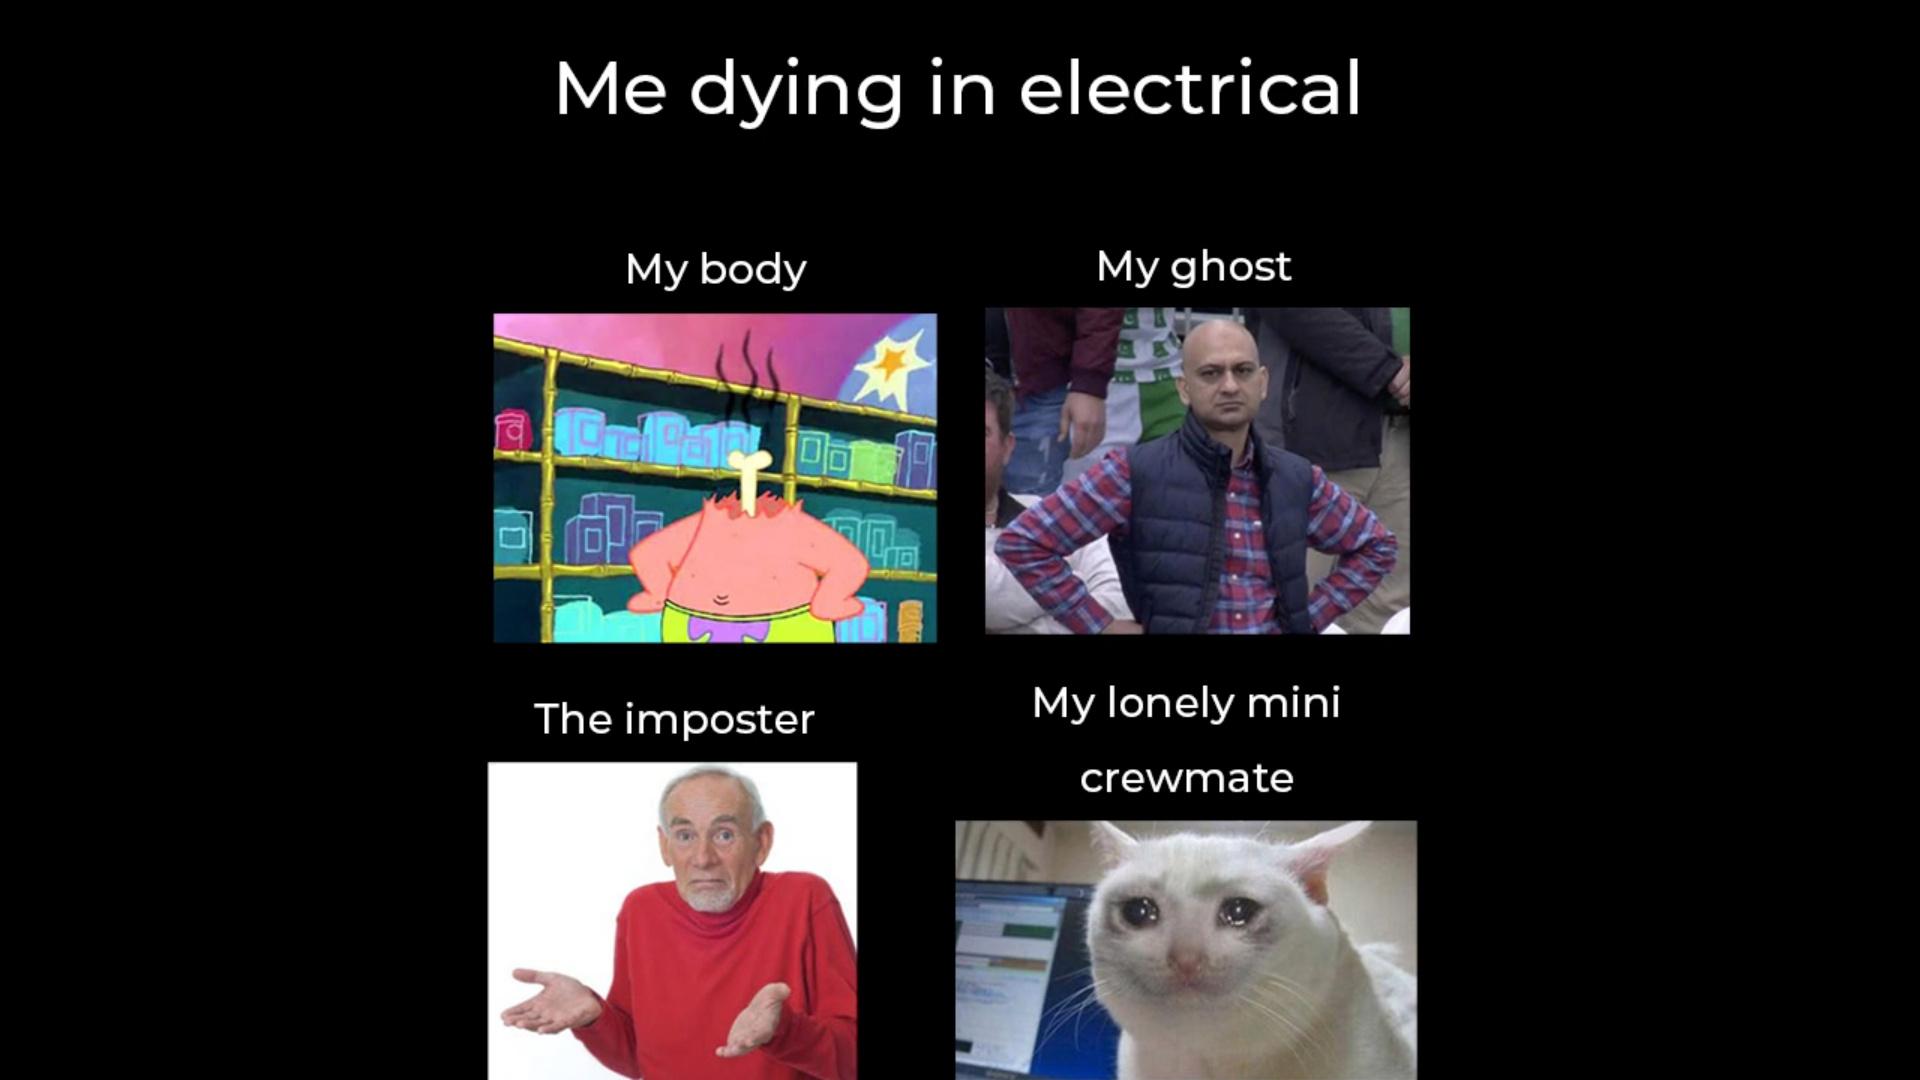 Electrical pire endroit du monde - meme